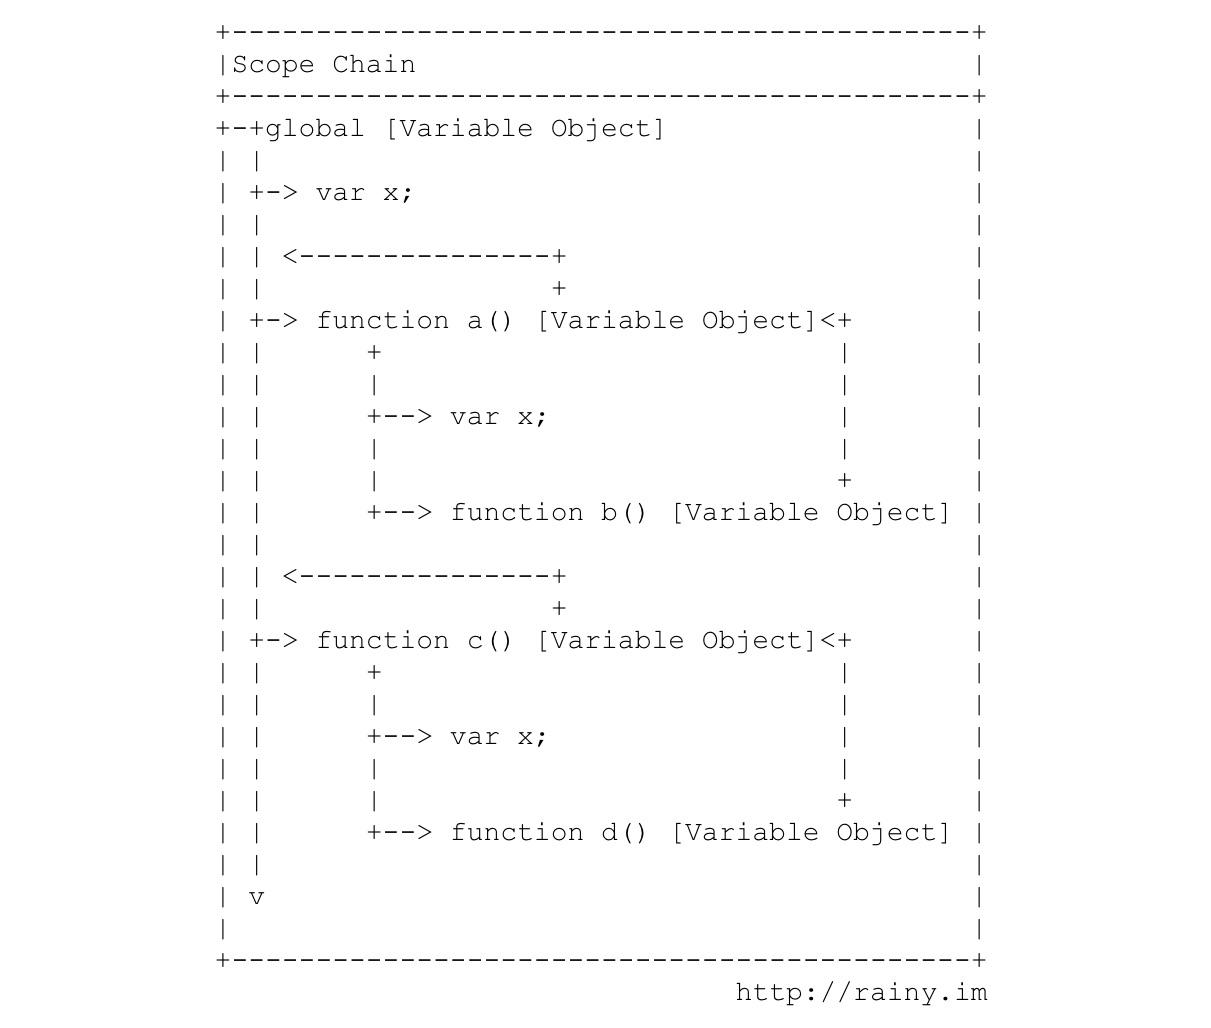 js scope chain